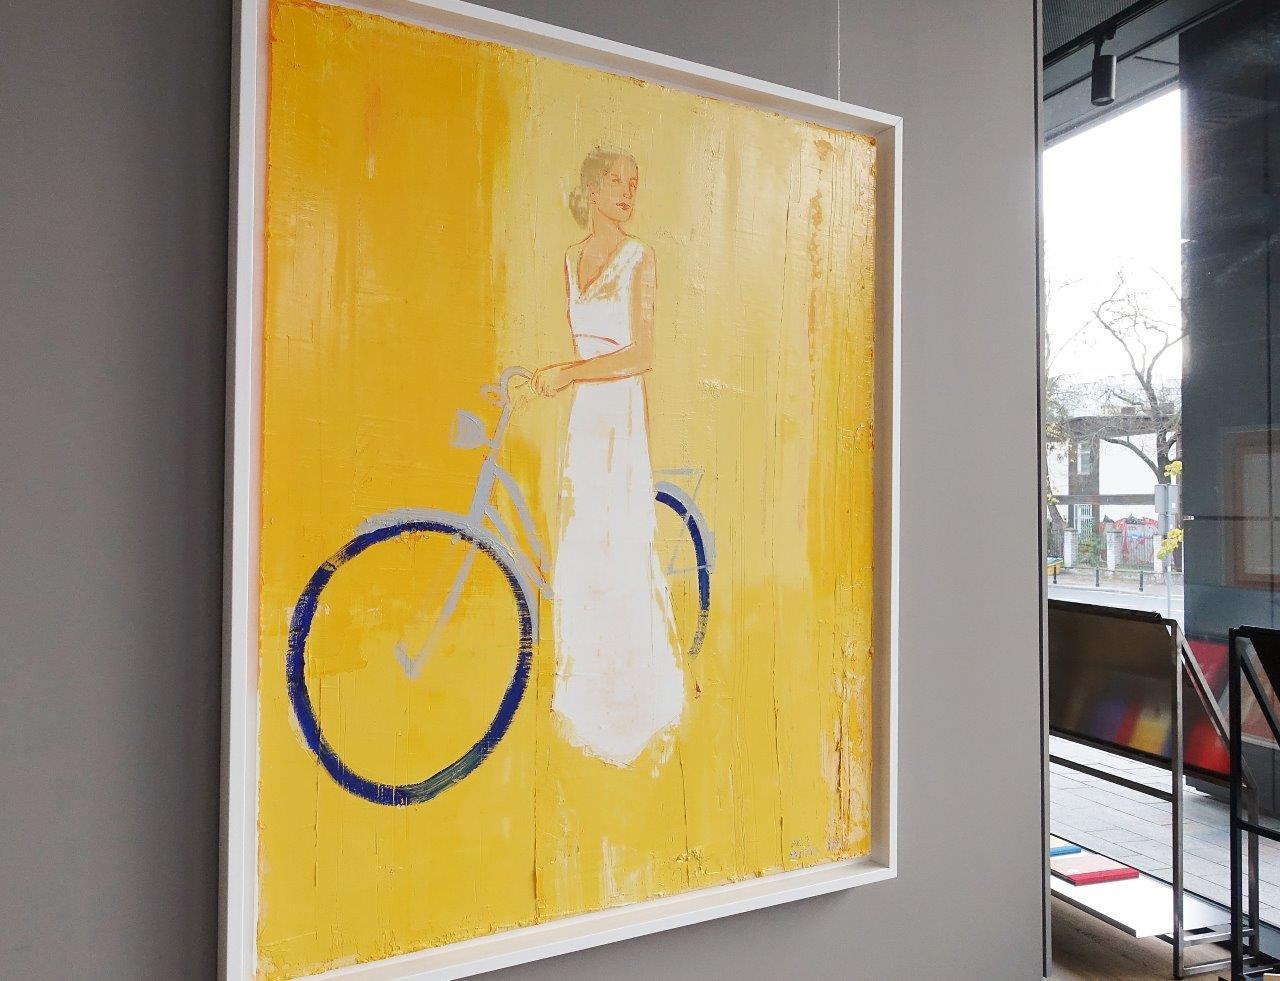 Jacek Łydżba : Cyclist in a white dress